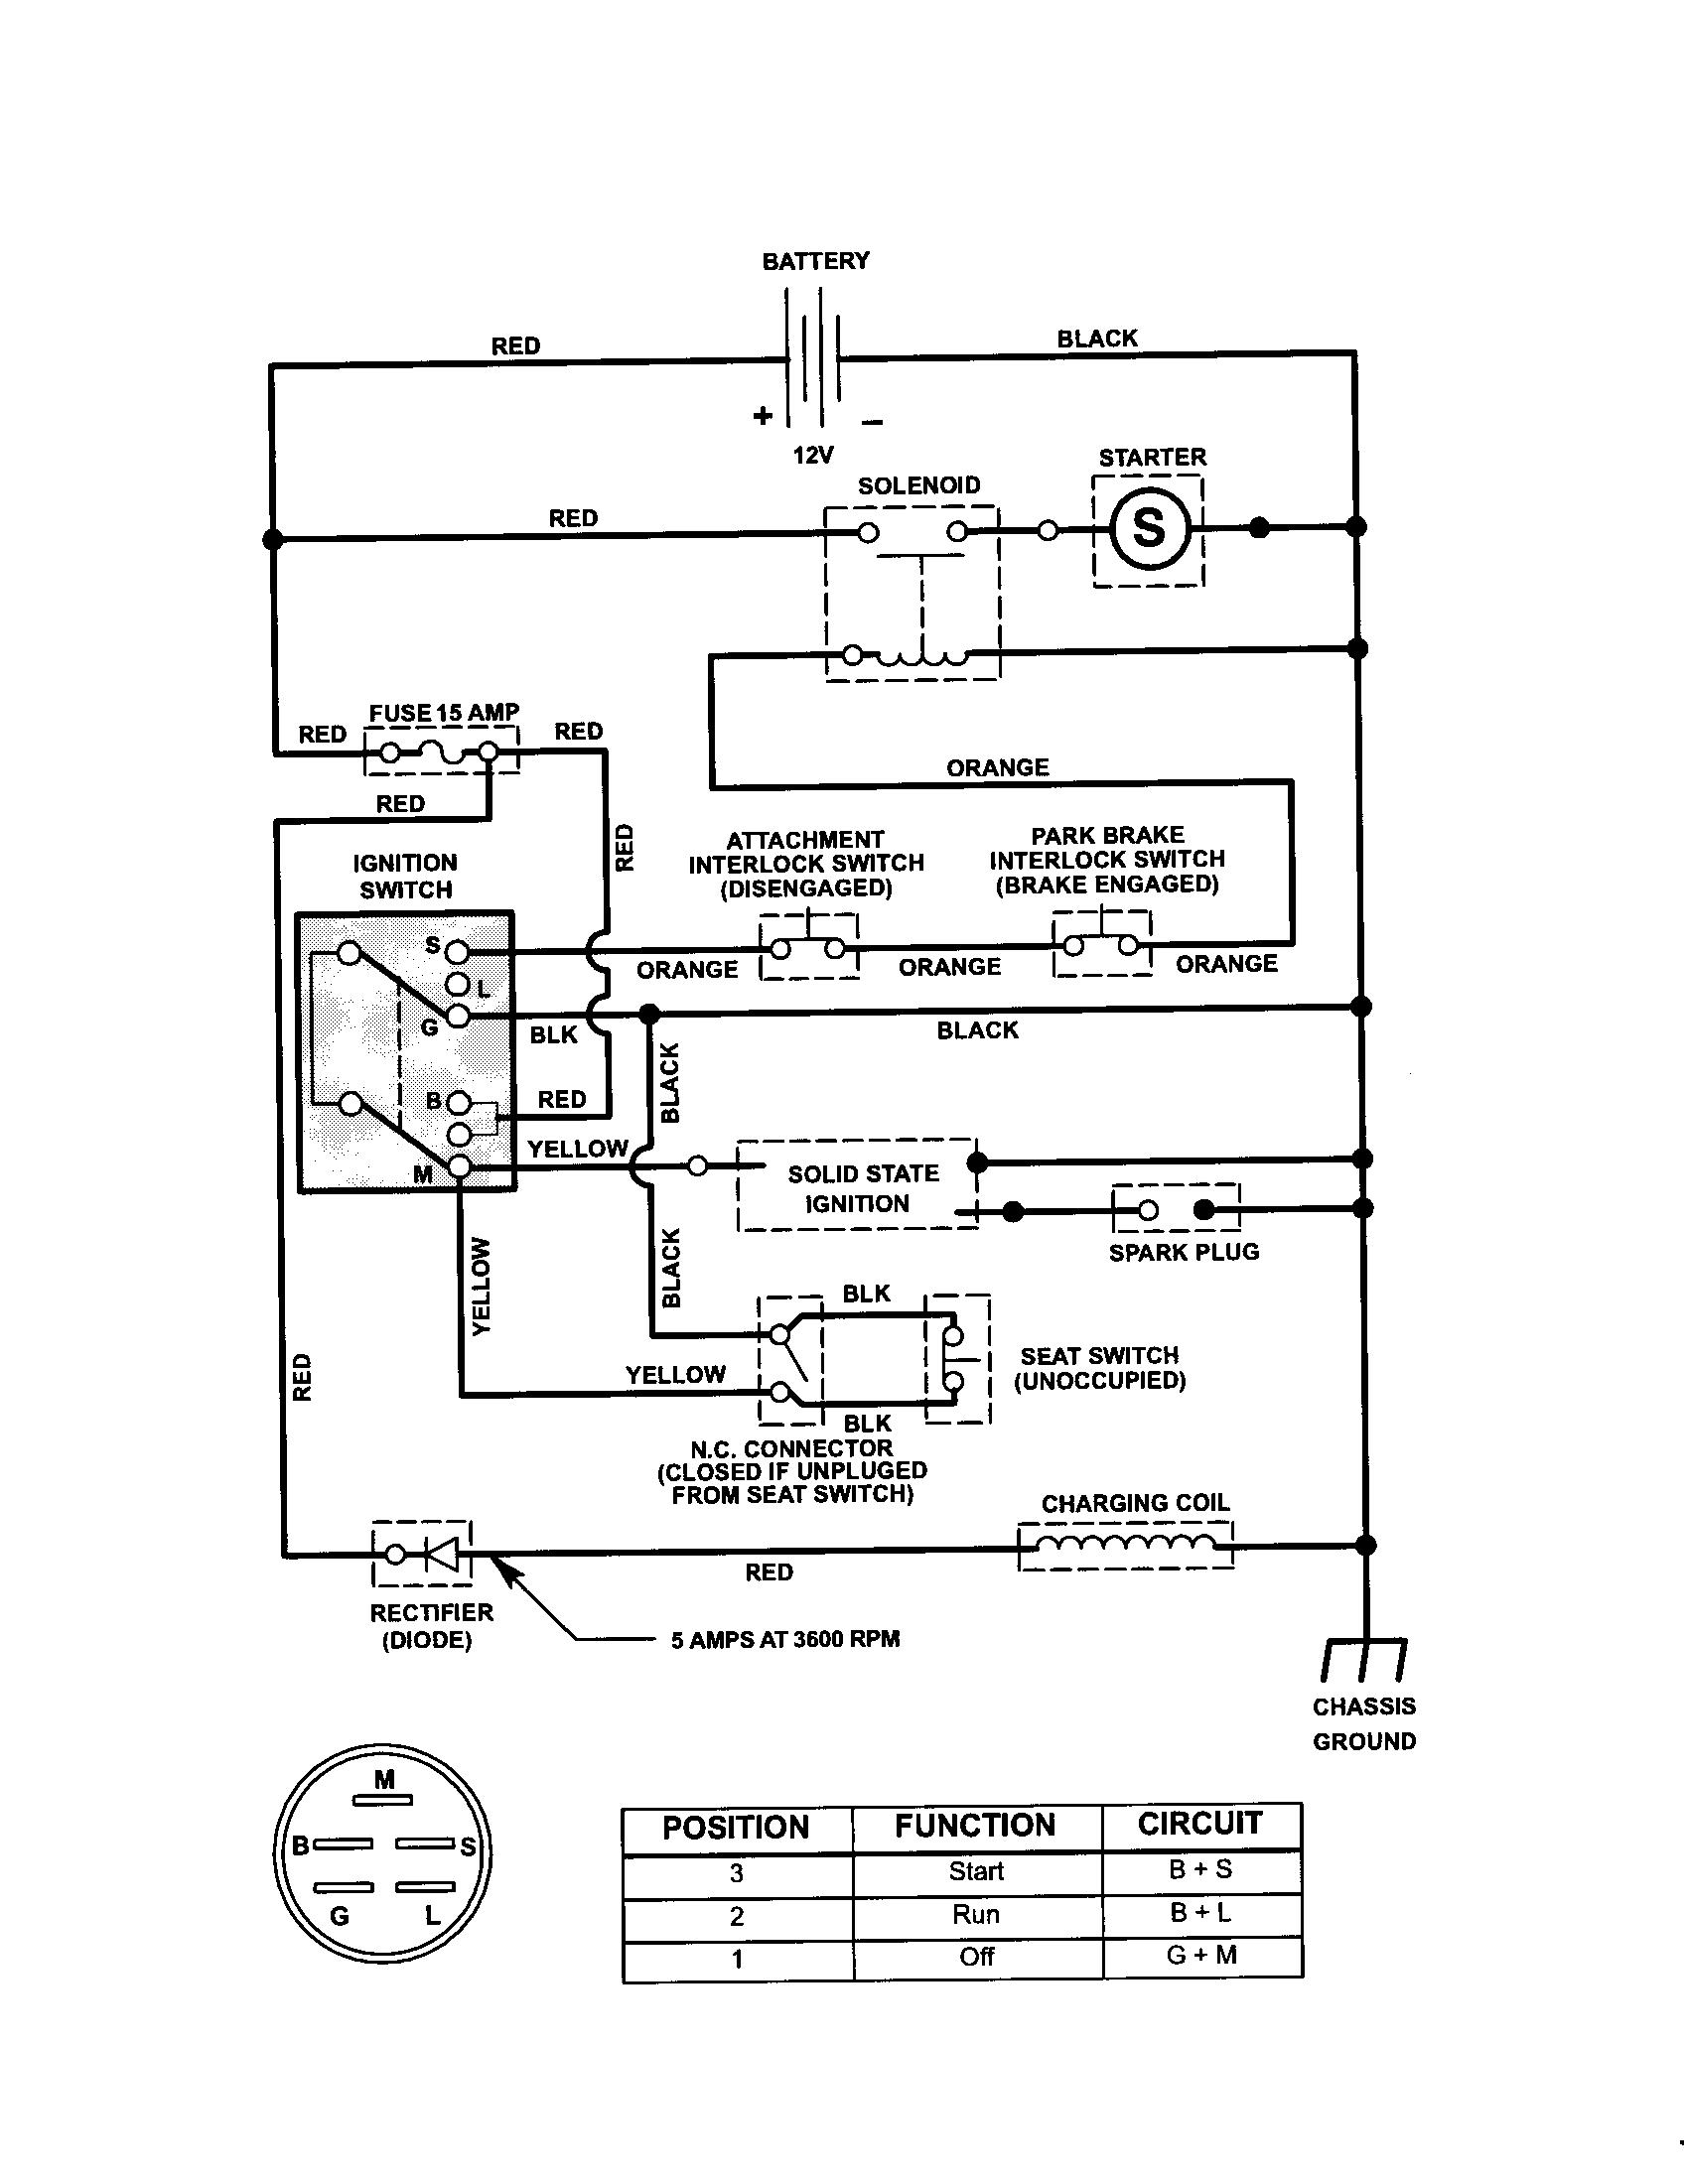 hight resolution of craftsman riding mower electrical diagram pictures of craftsman riding mower electrical diagram